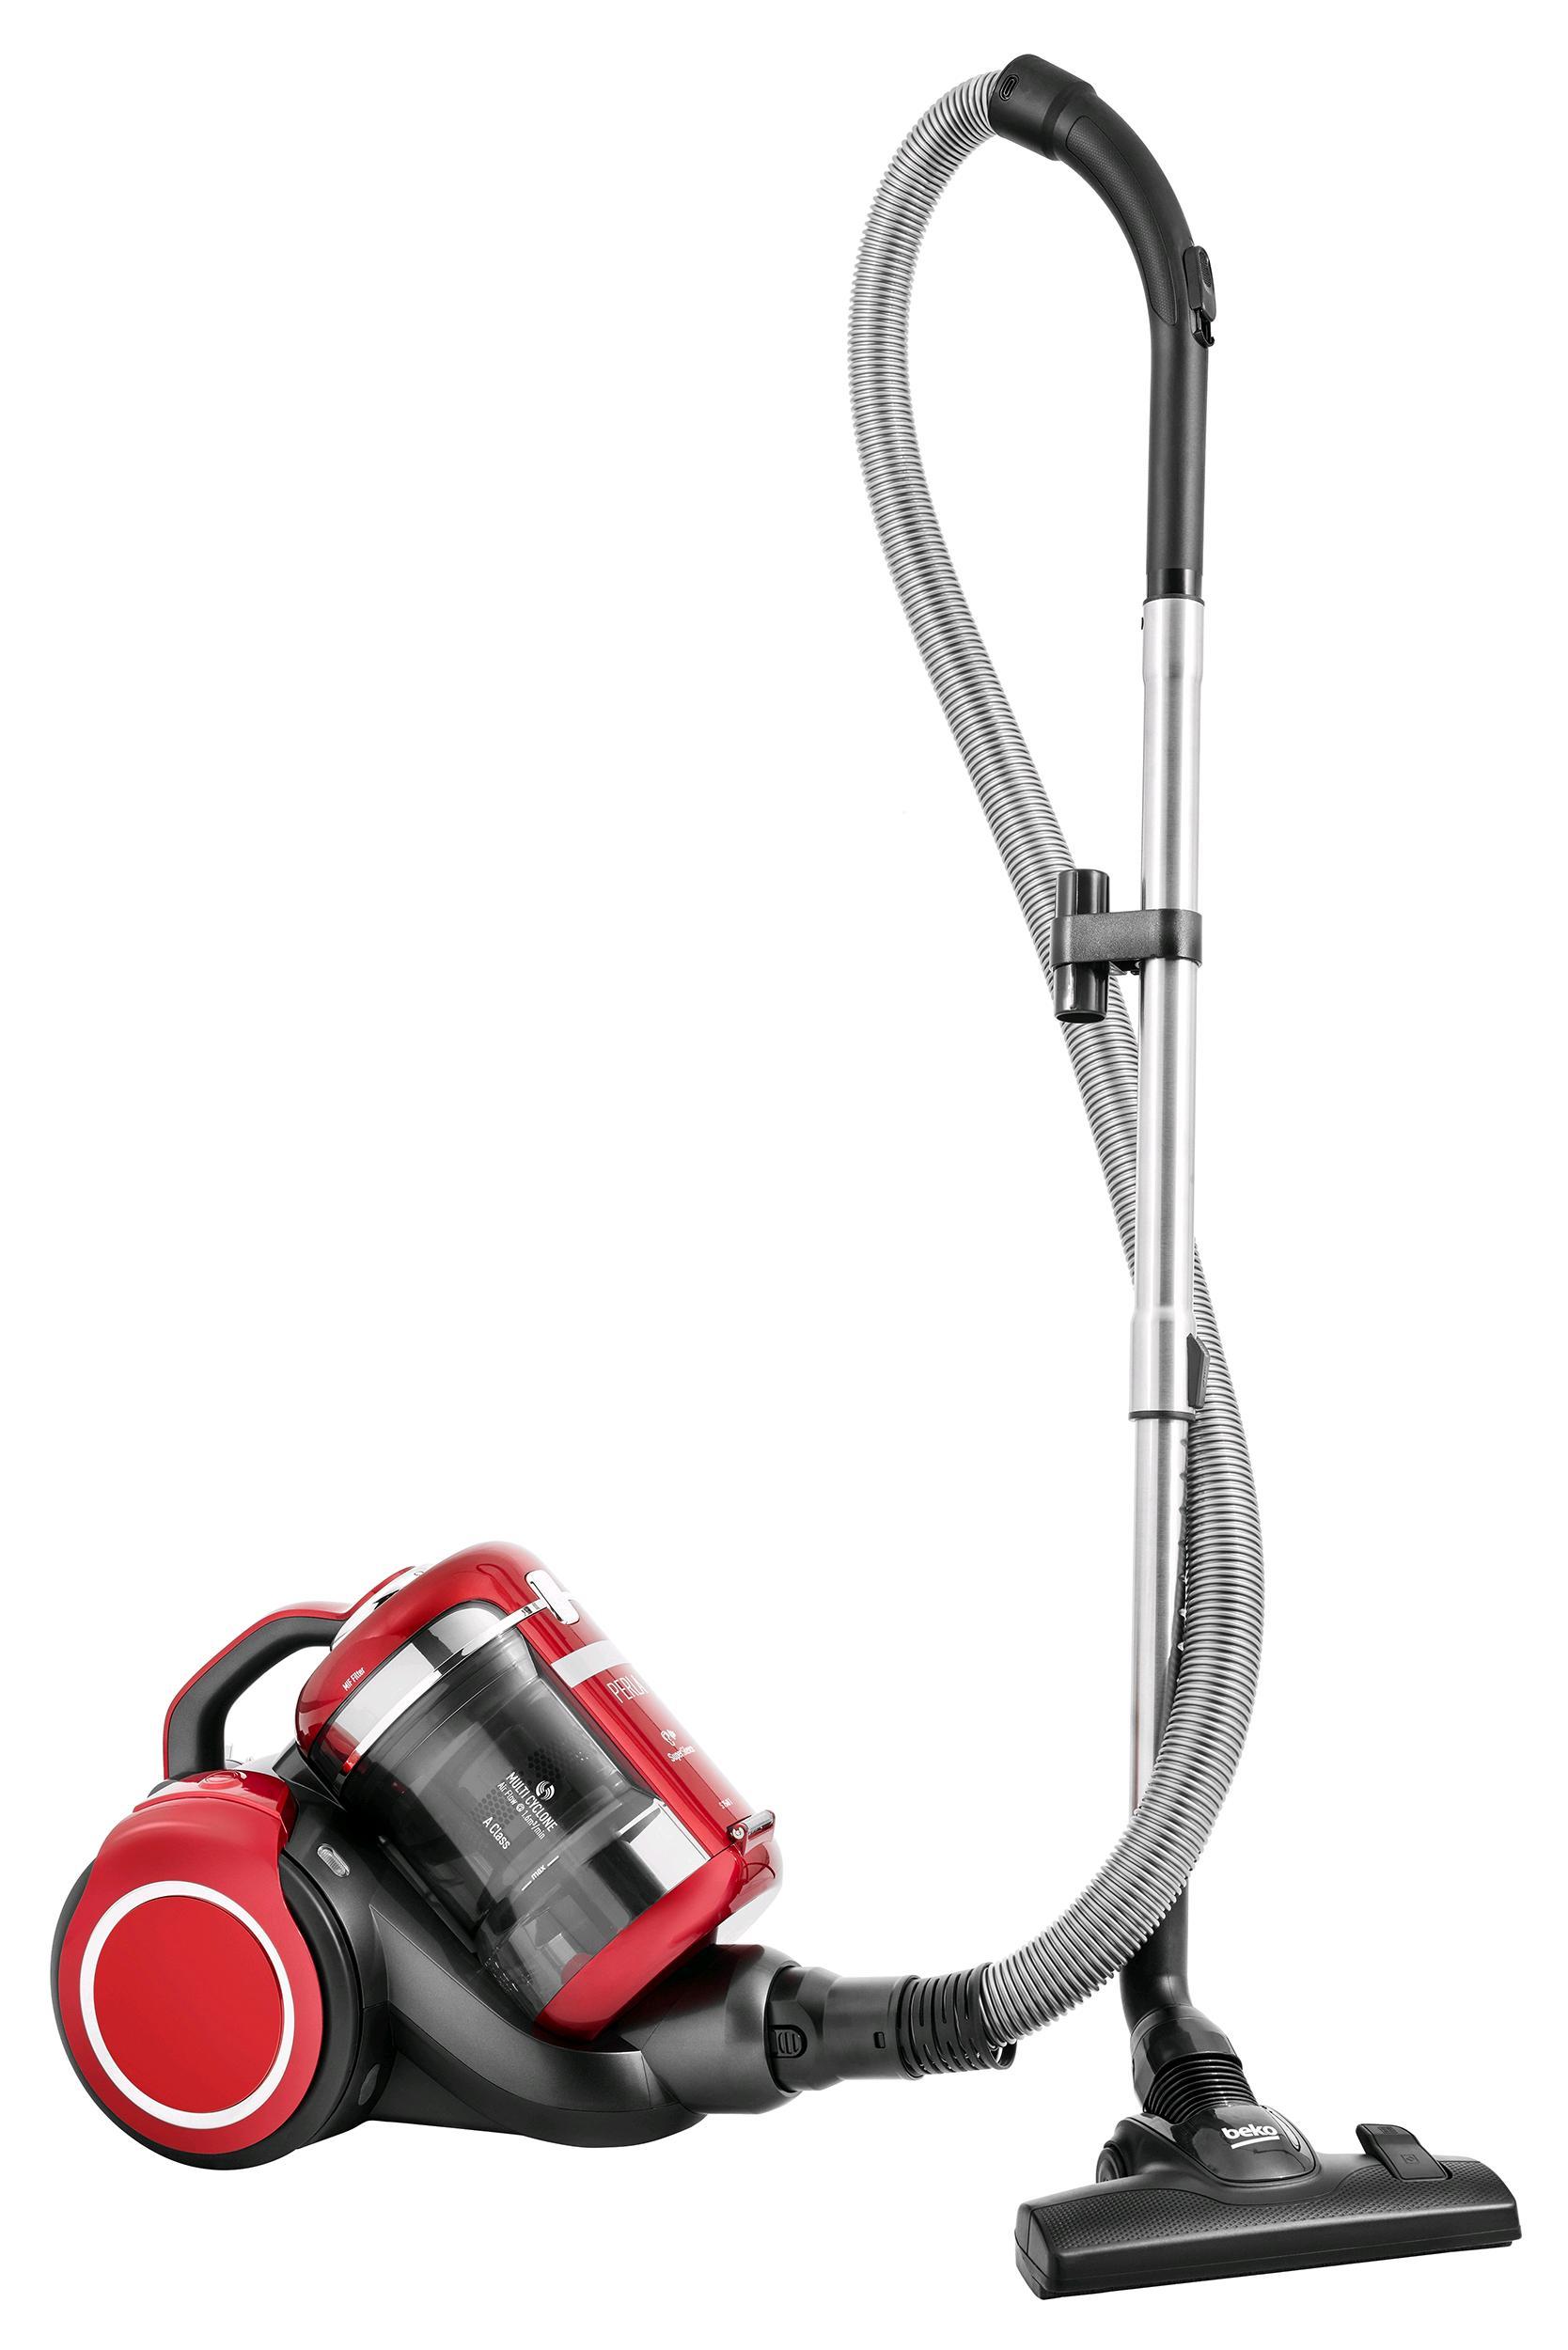 Beko Cylinder Vacuum 800w 2.8L Dust Capacity